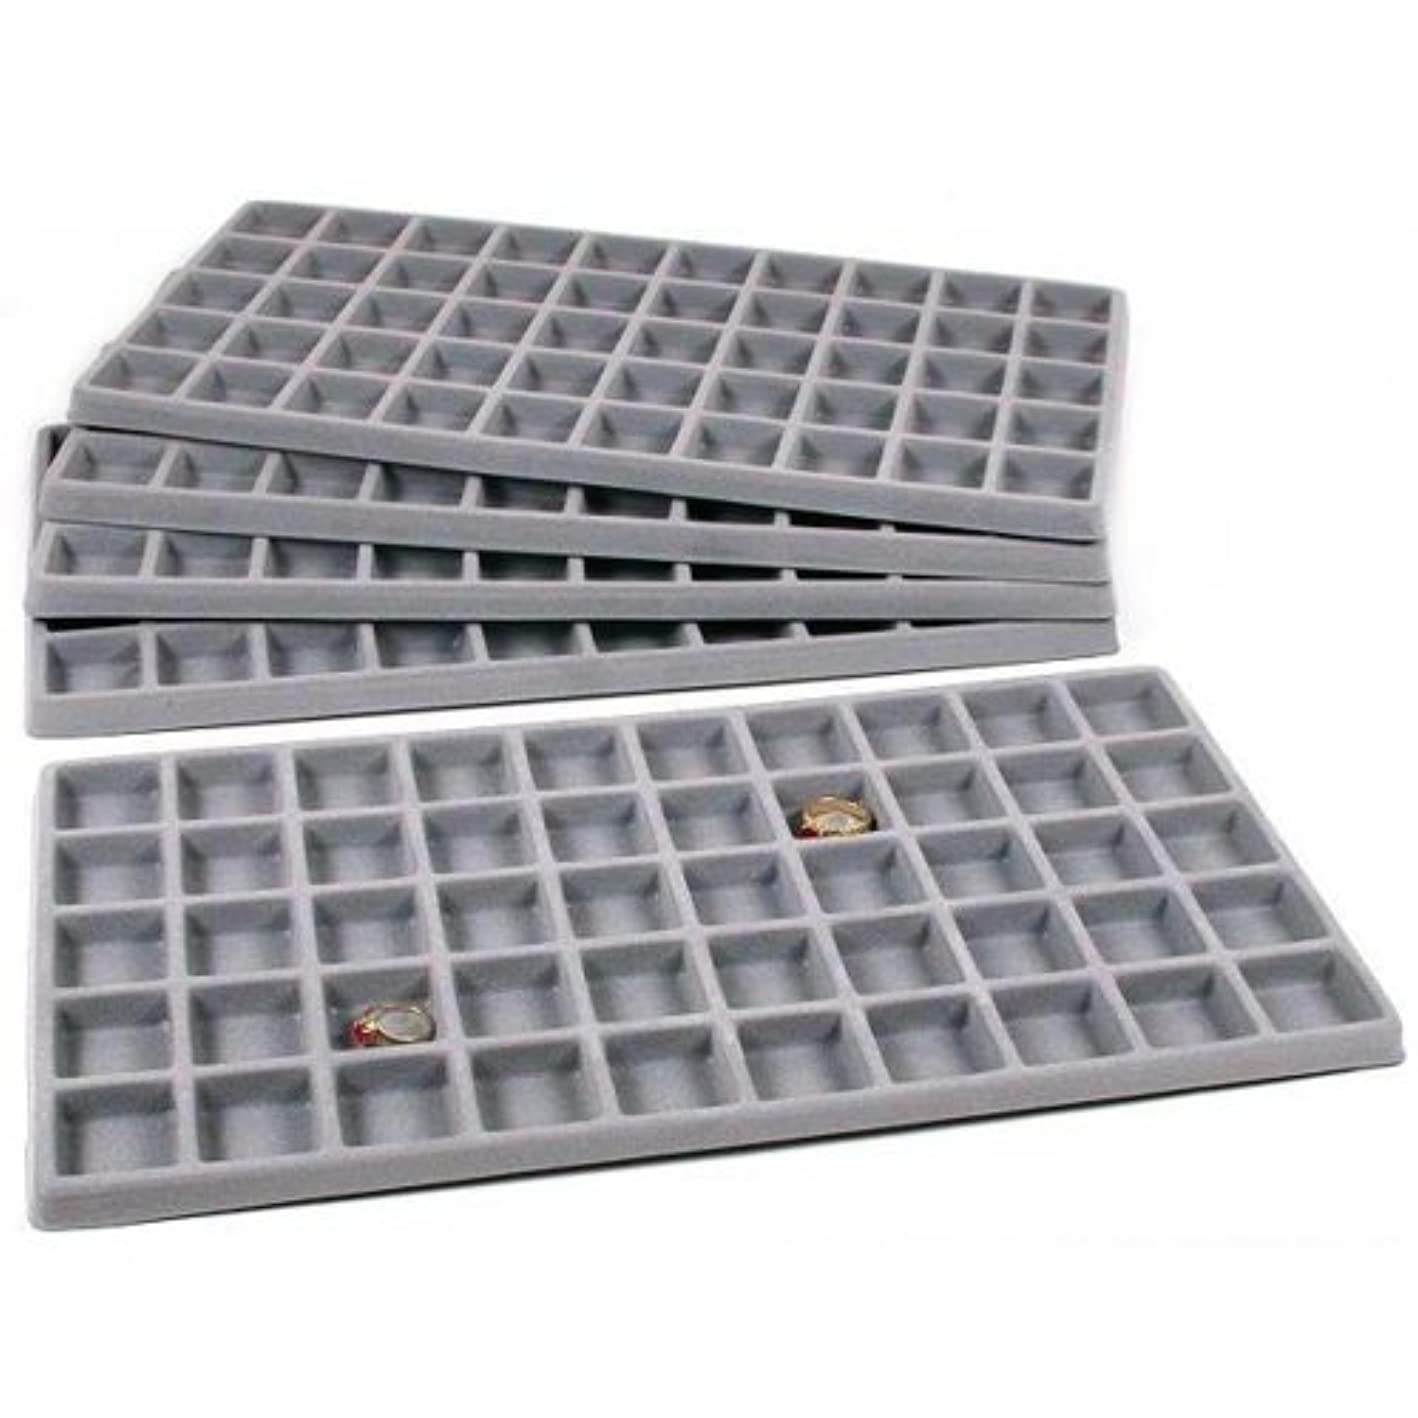 FindingKing 5 Gray 50 Slot Pendant Jewelry Showcase Display Tray Inserts